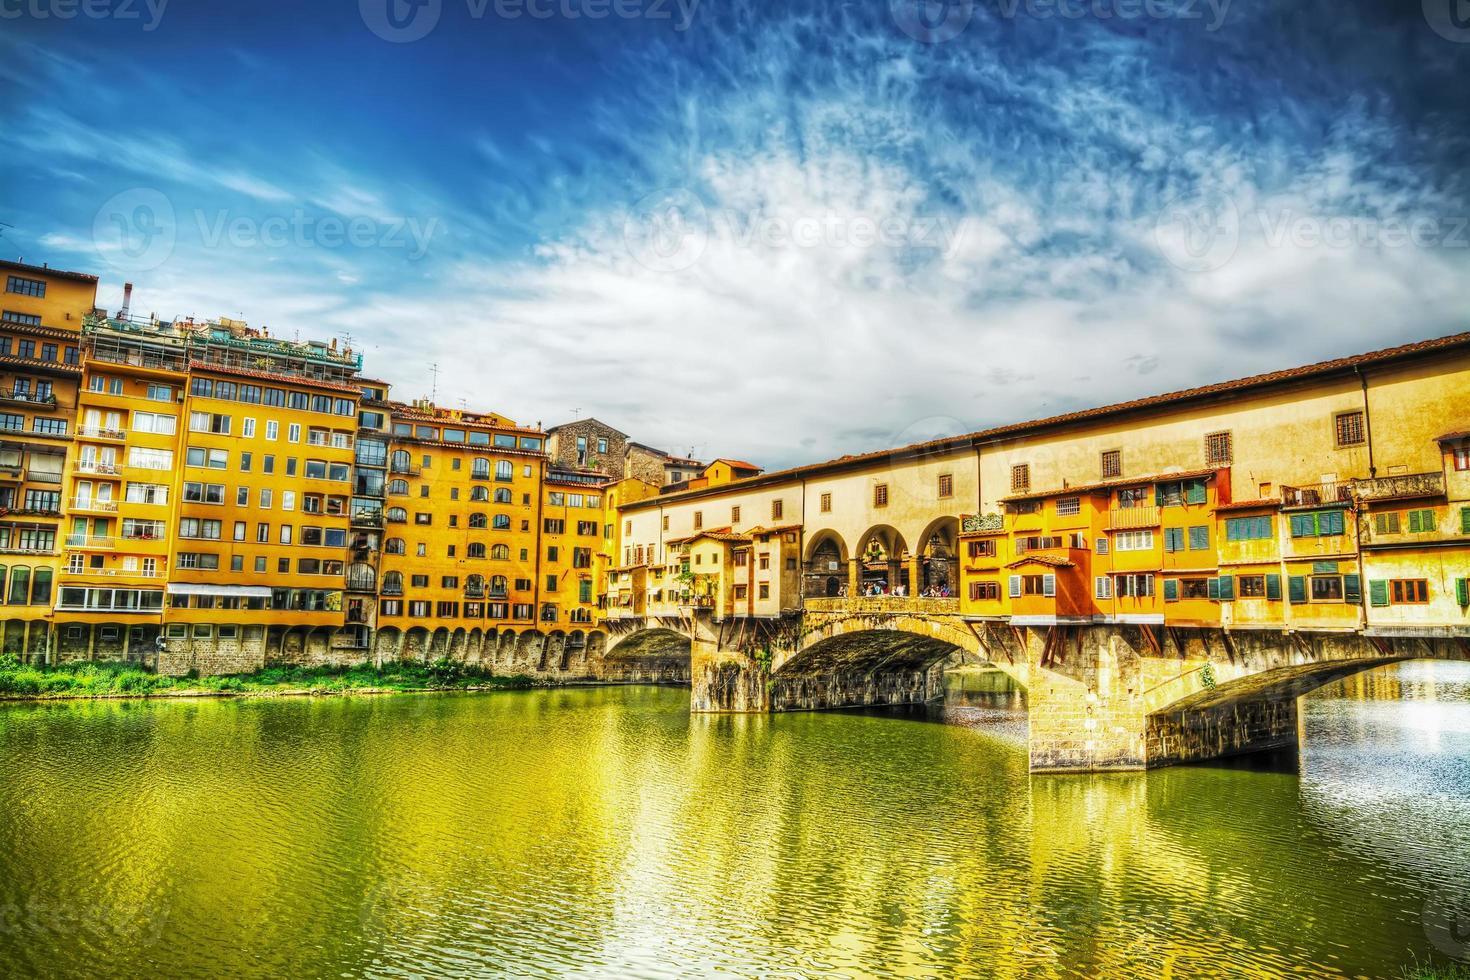 ponte vecchio sett från Arno Bank i Florens foto